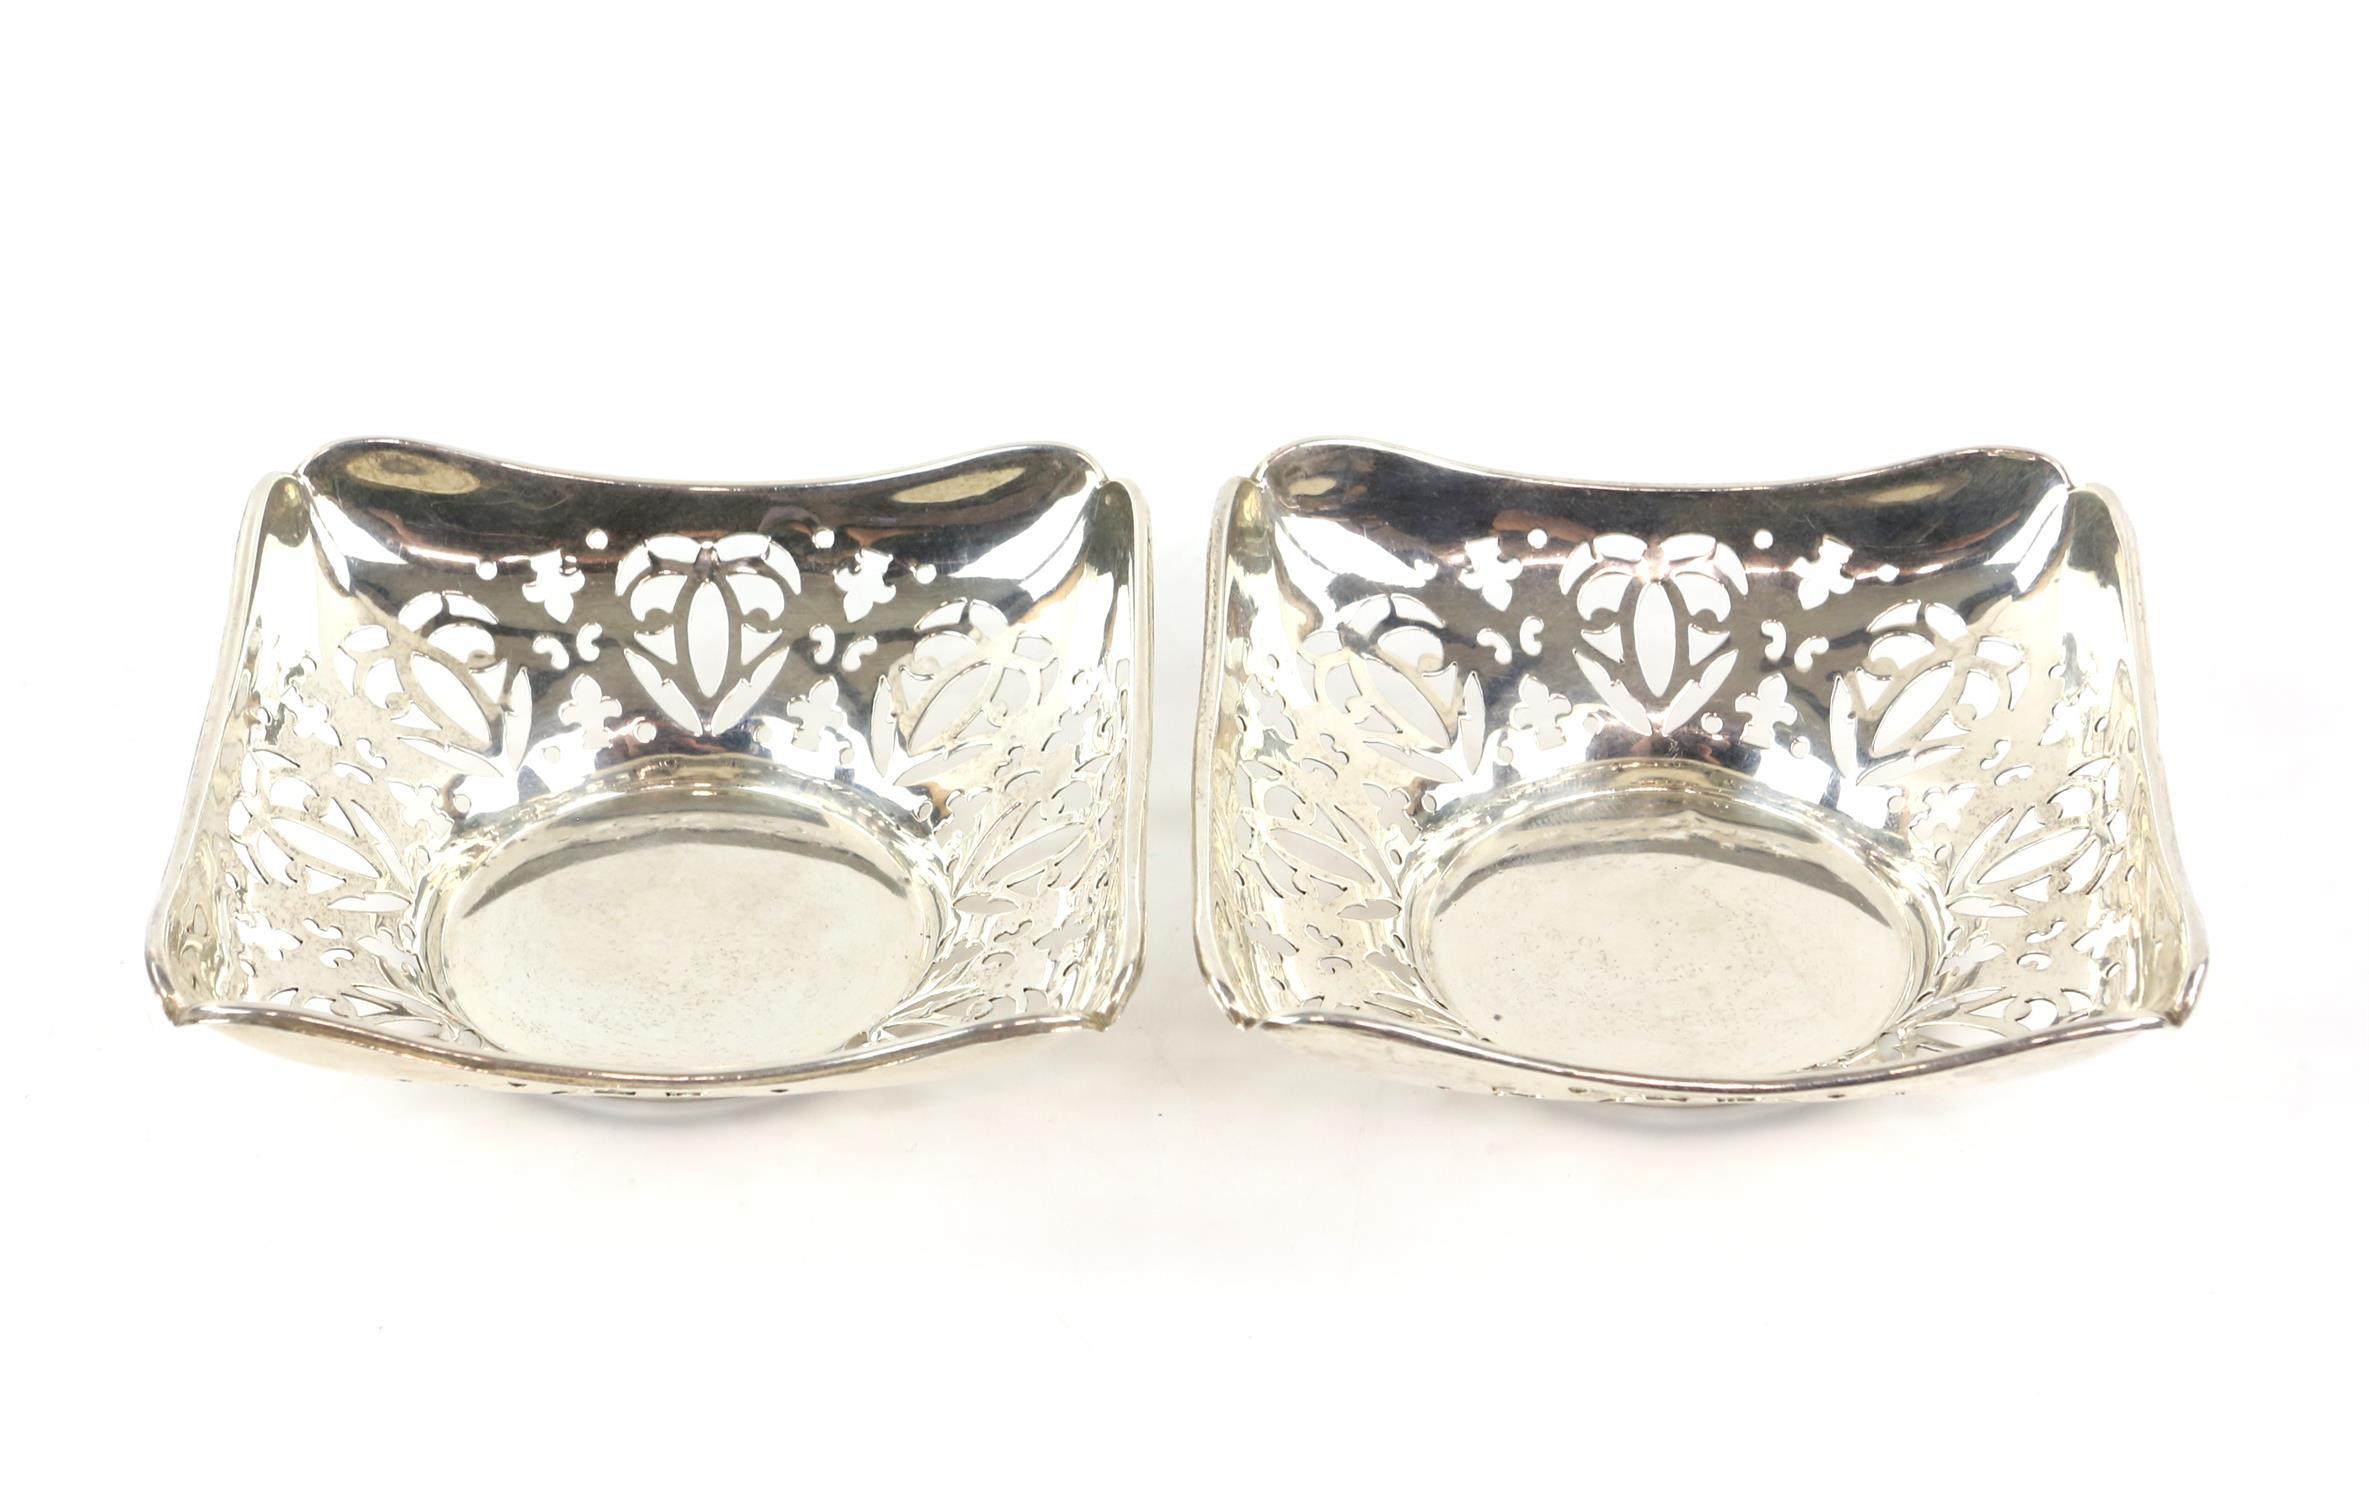 Pair of pierced square form silver Bon Bon dishes by Deaken and Francis, Birmingham 1910